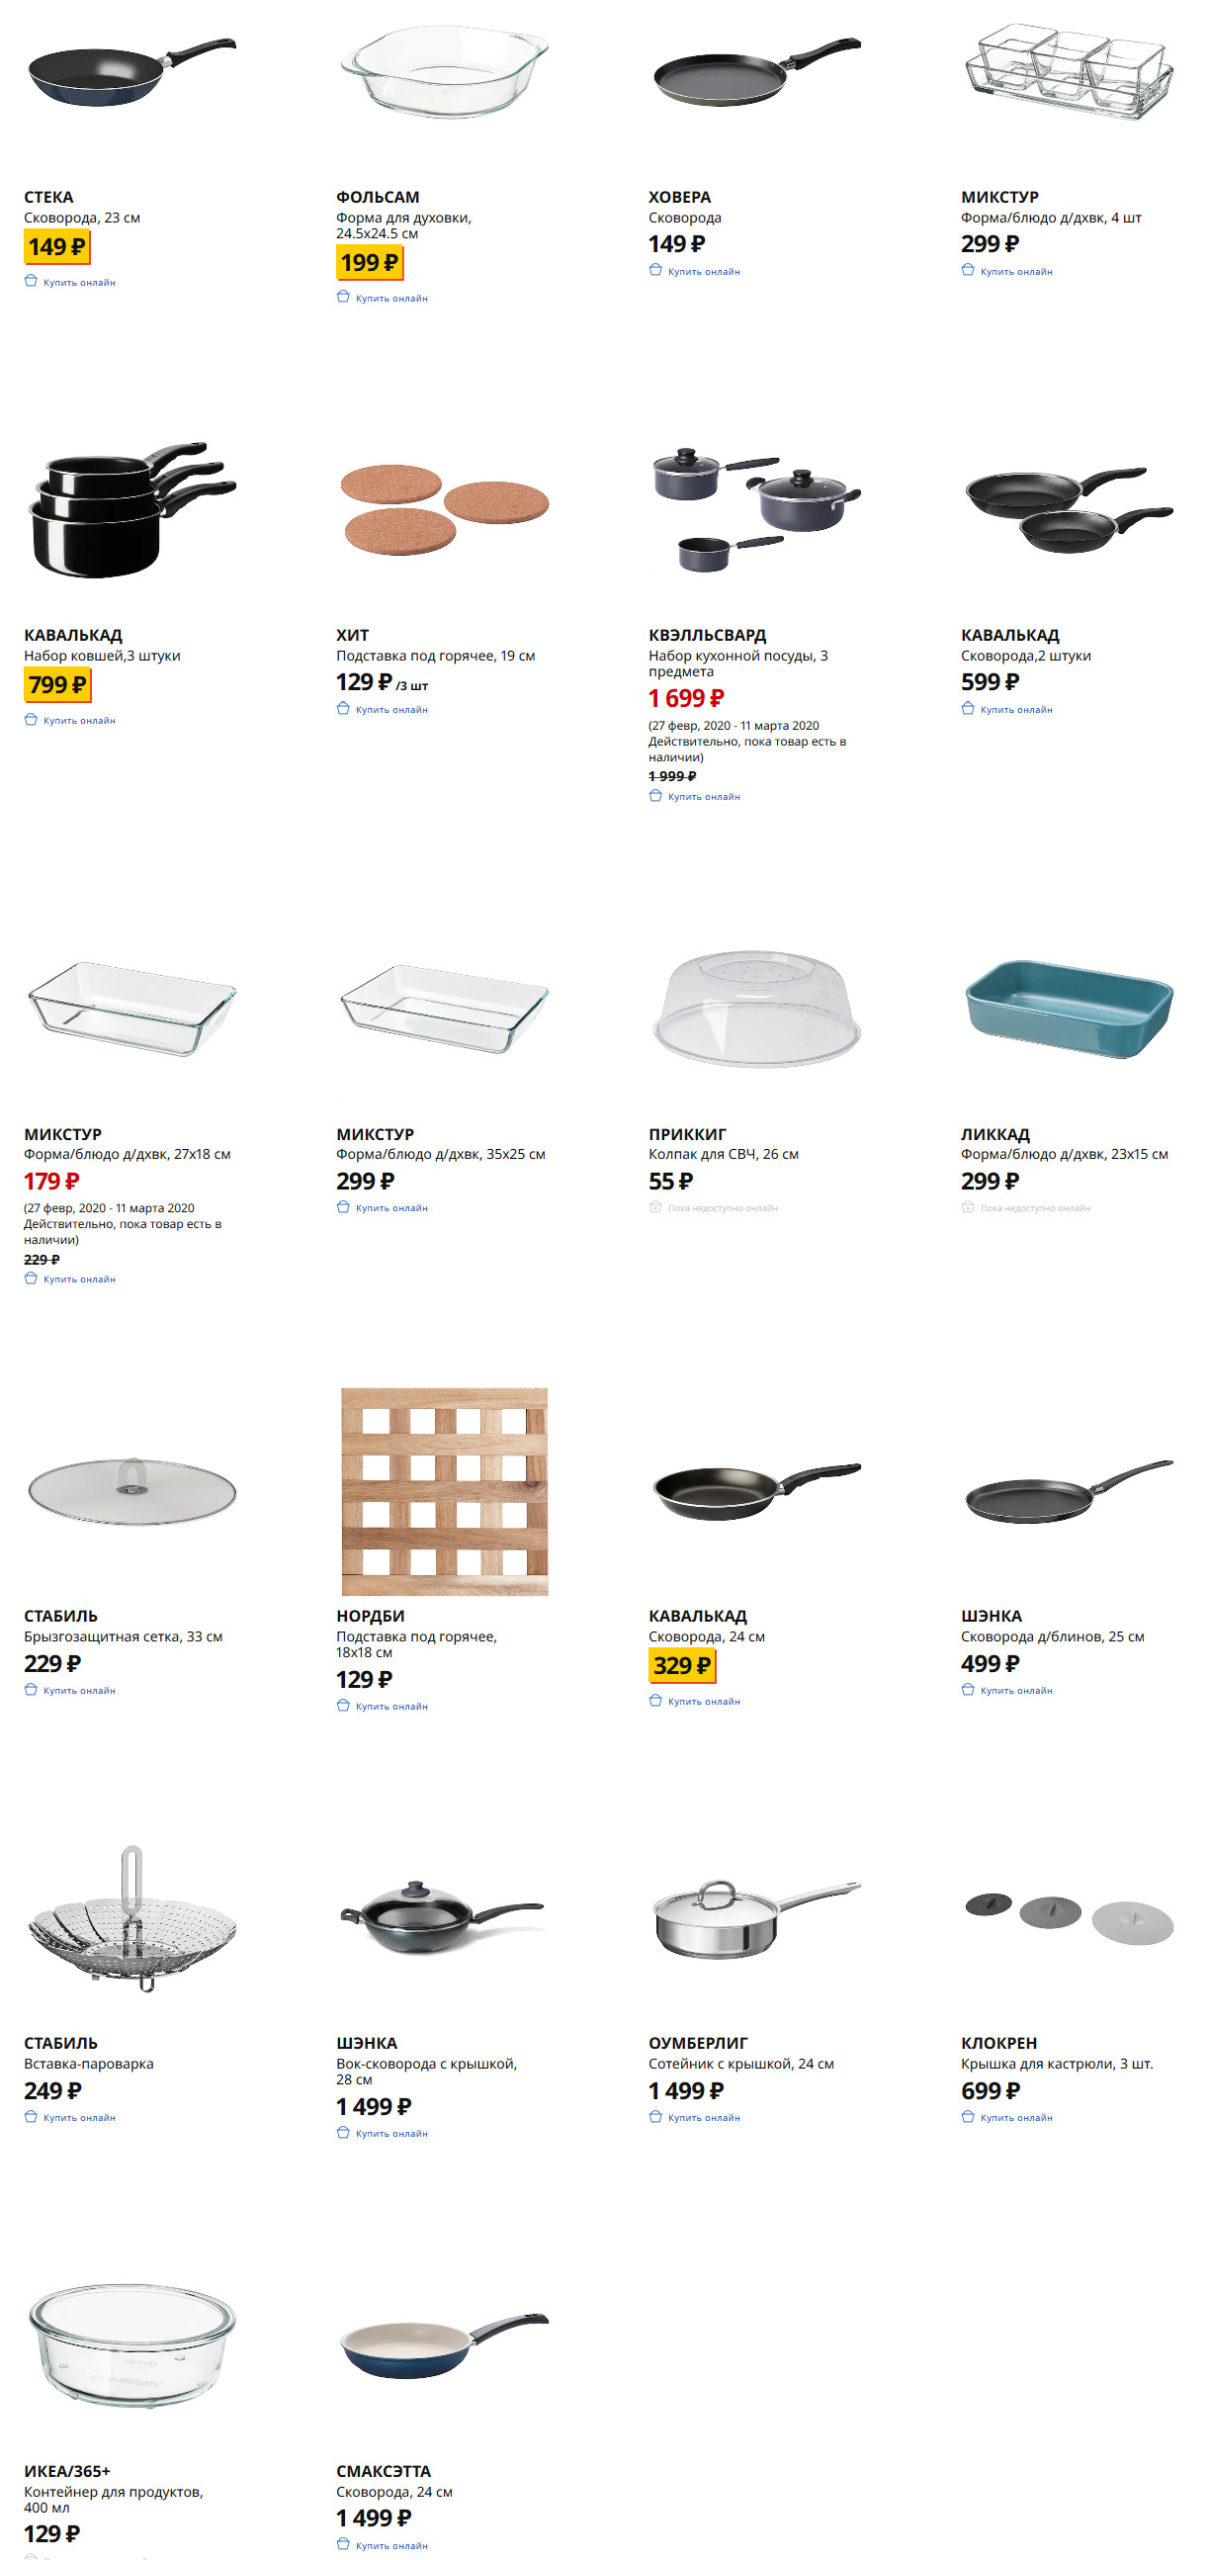 Кухонная посуда Икеа